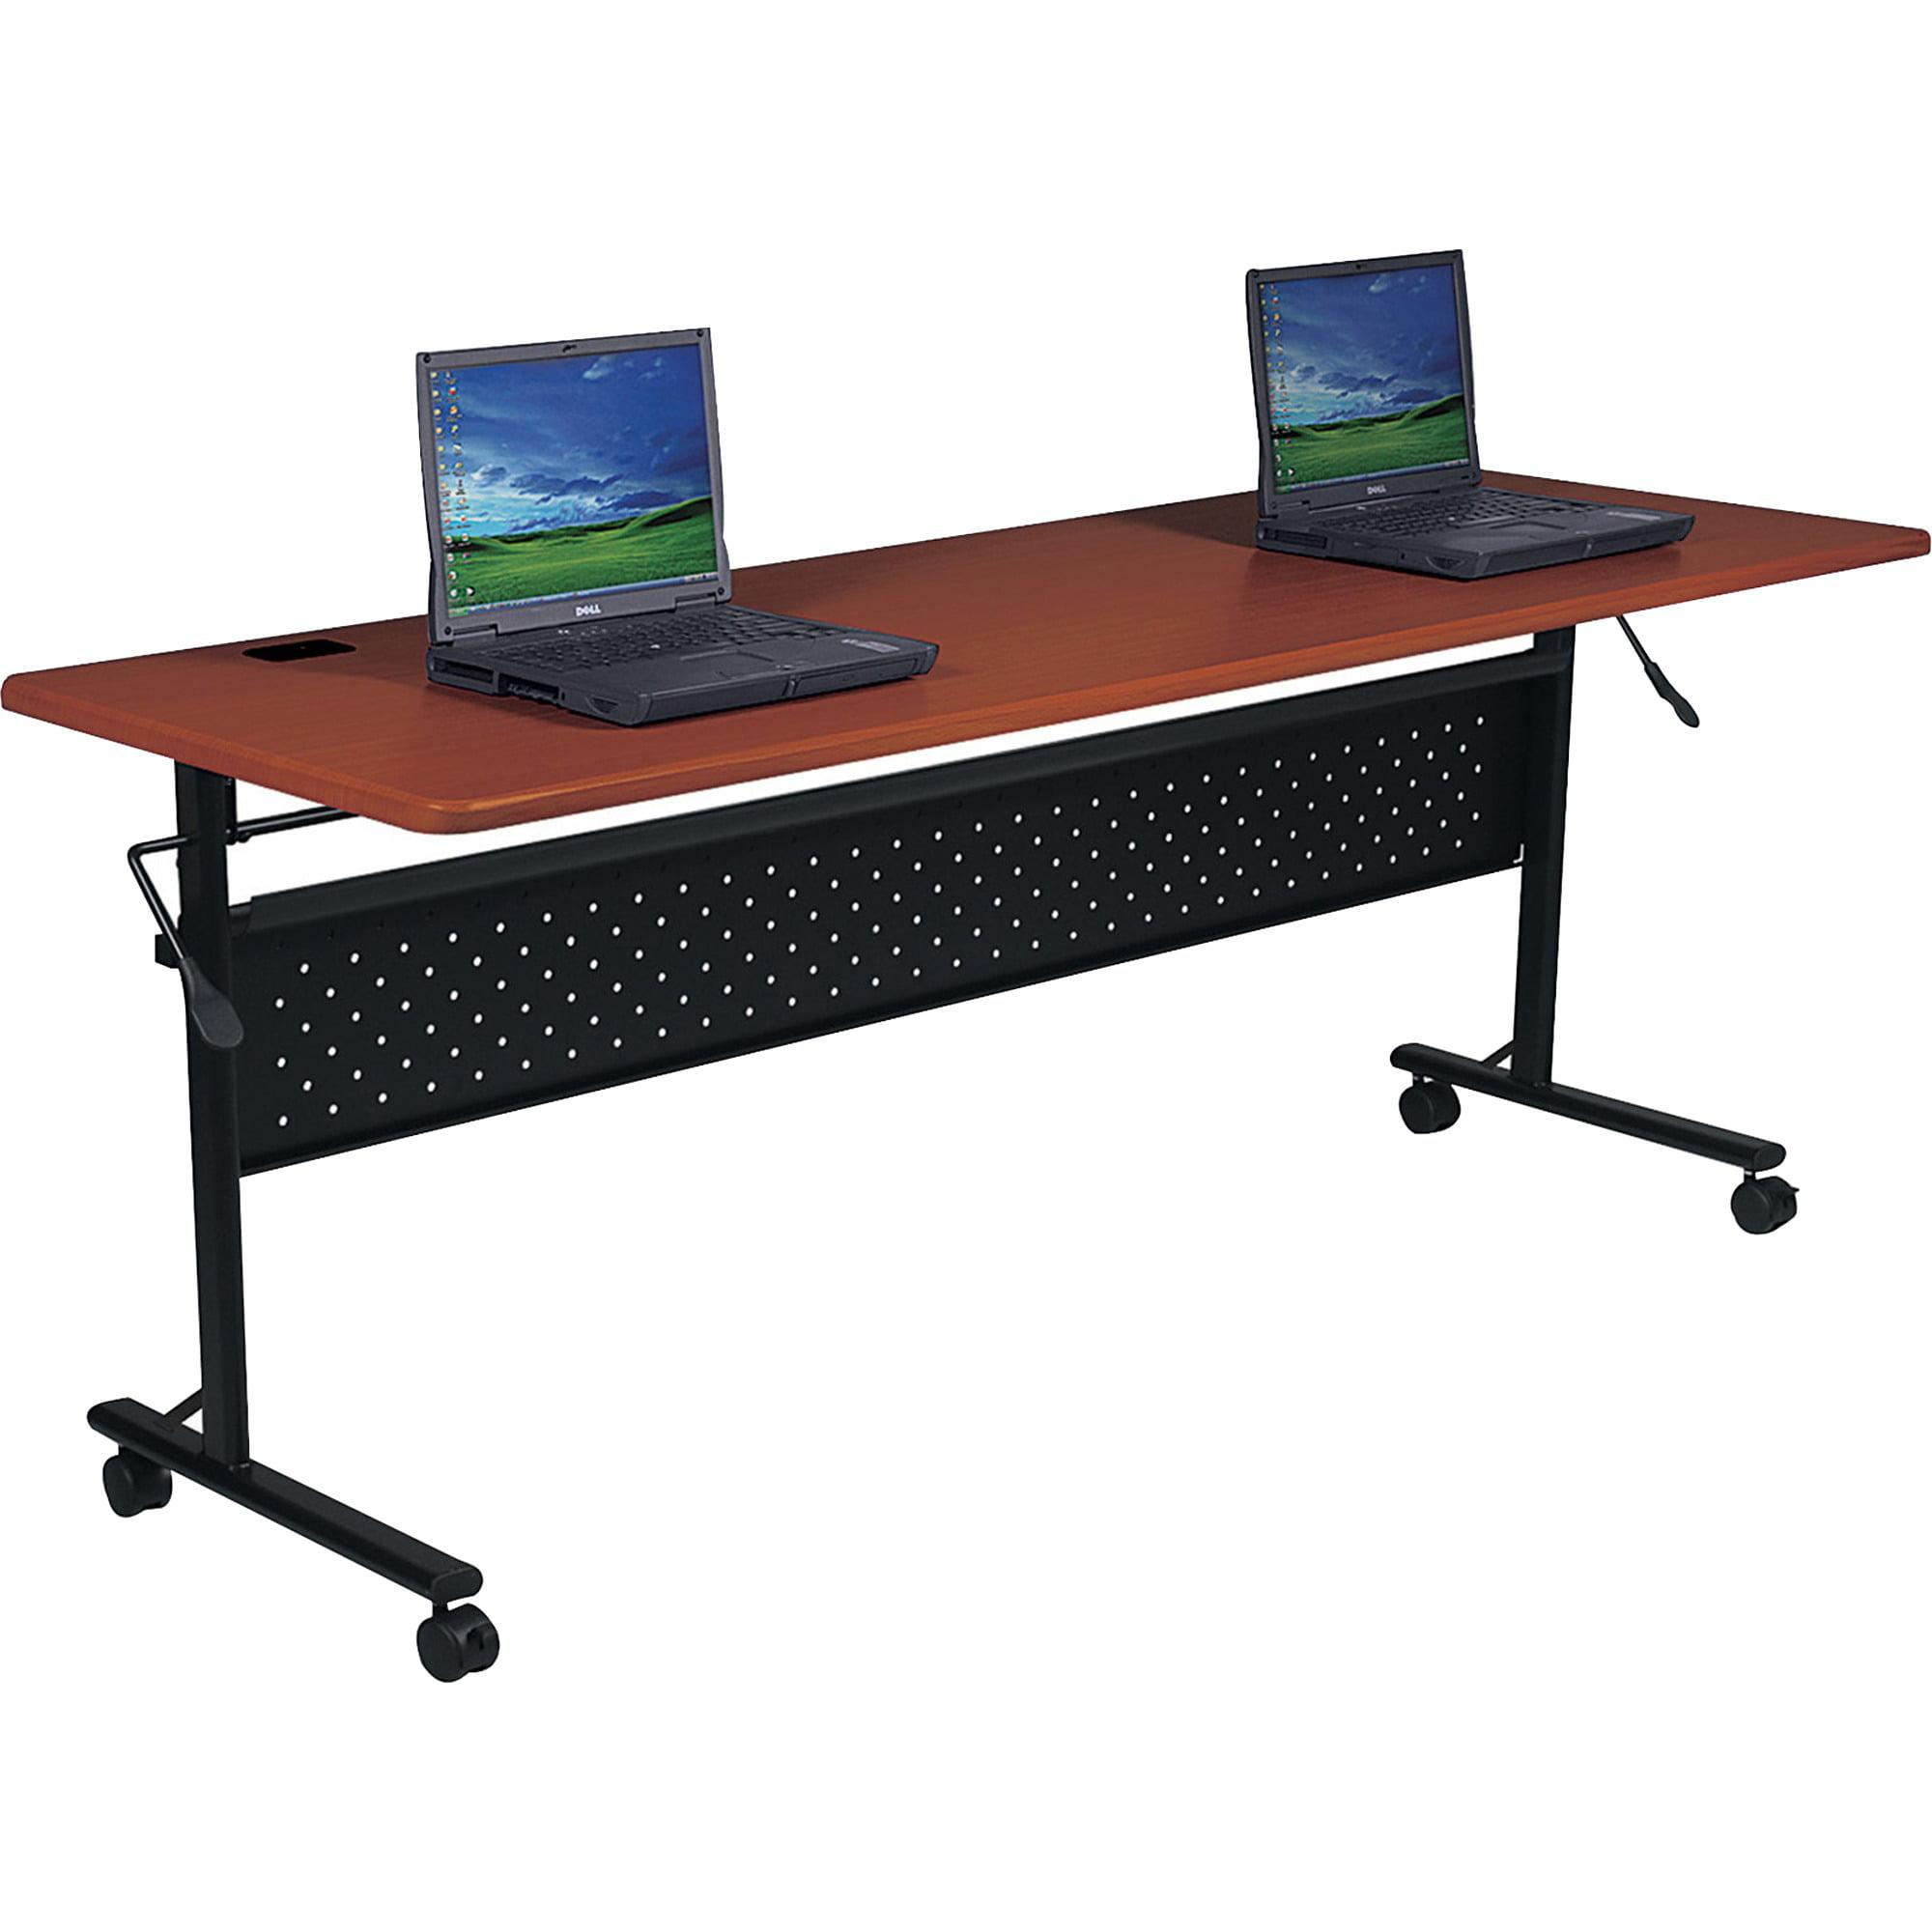 Lorell, LLR60666, Flipper Training Table, 1 Each